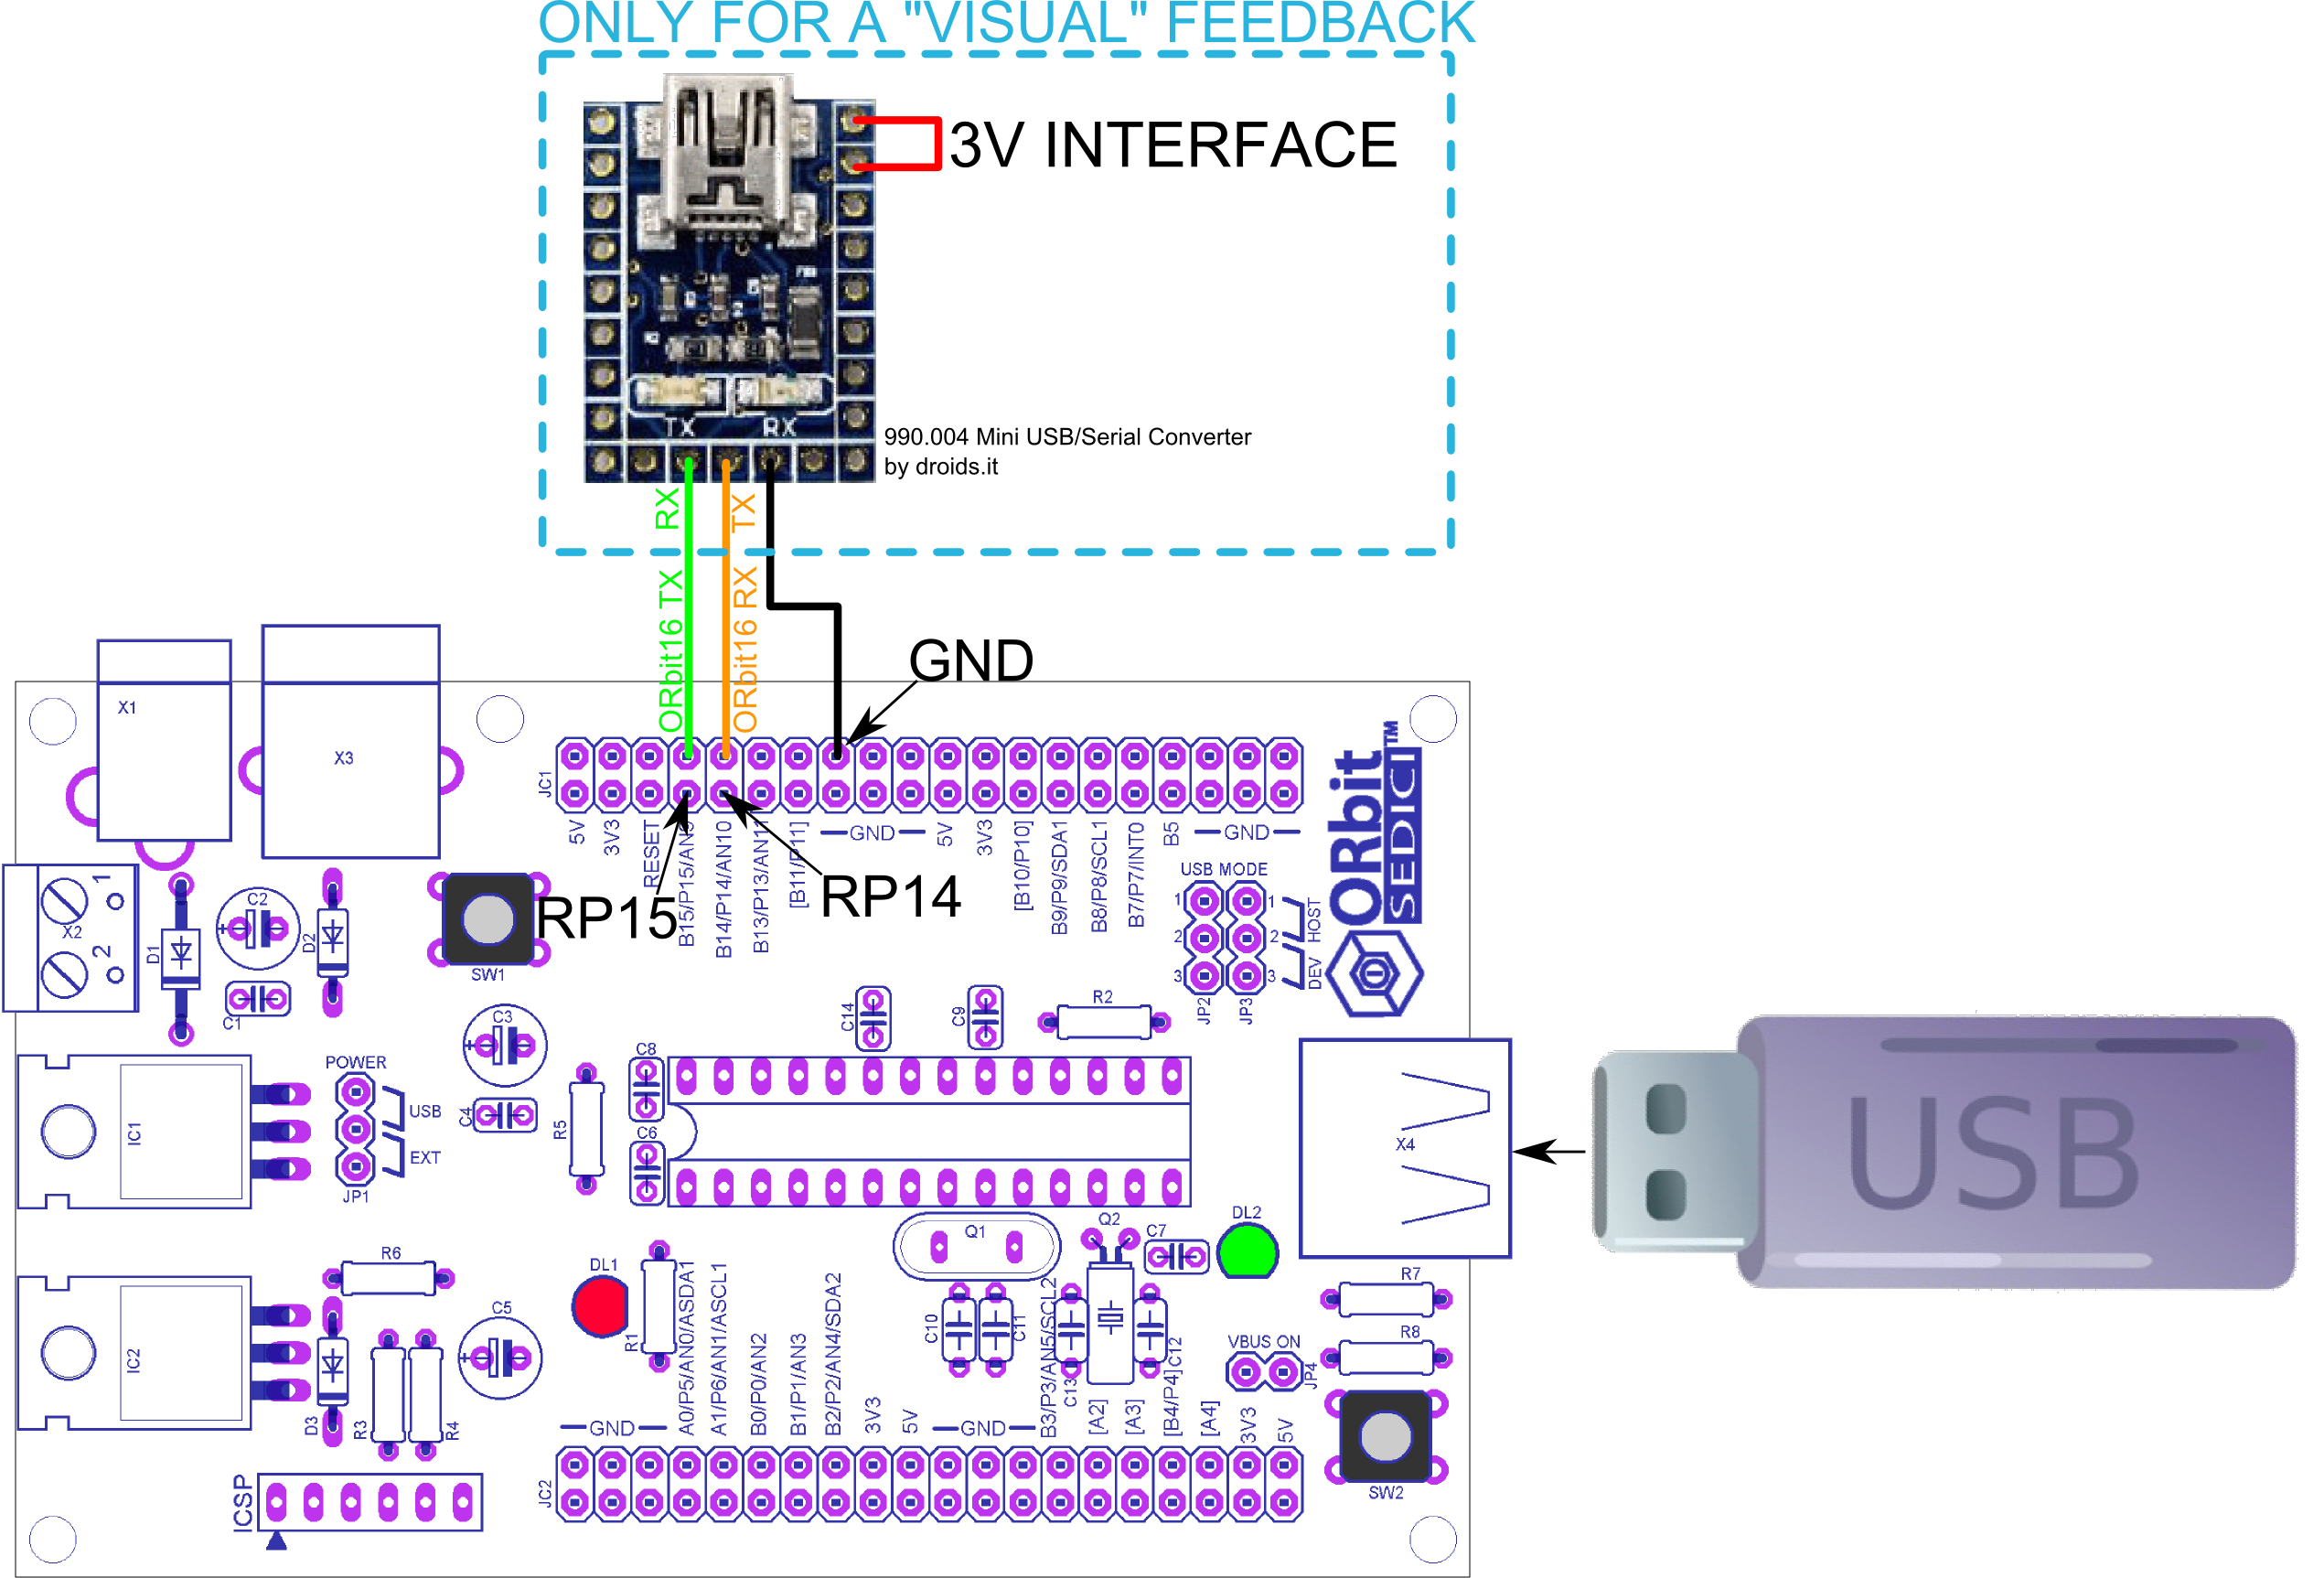 wiring diagram usb mouse wiring image wiring diagram usb optical mouse circuit diagram the wiring diagram on wiring diagram usb mouse